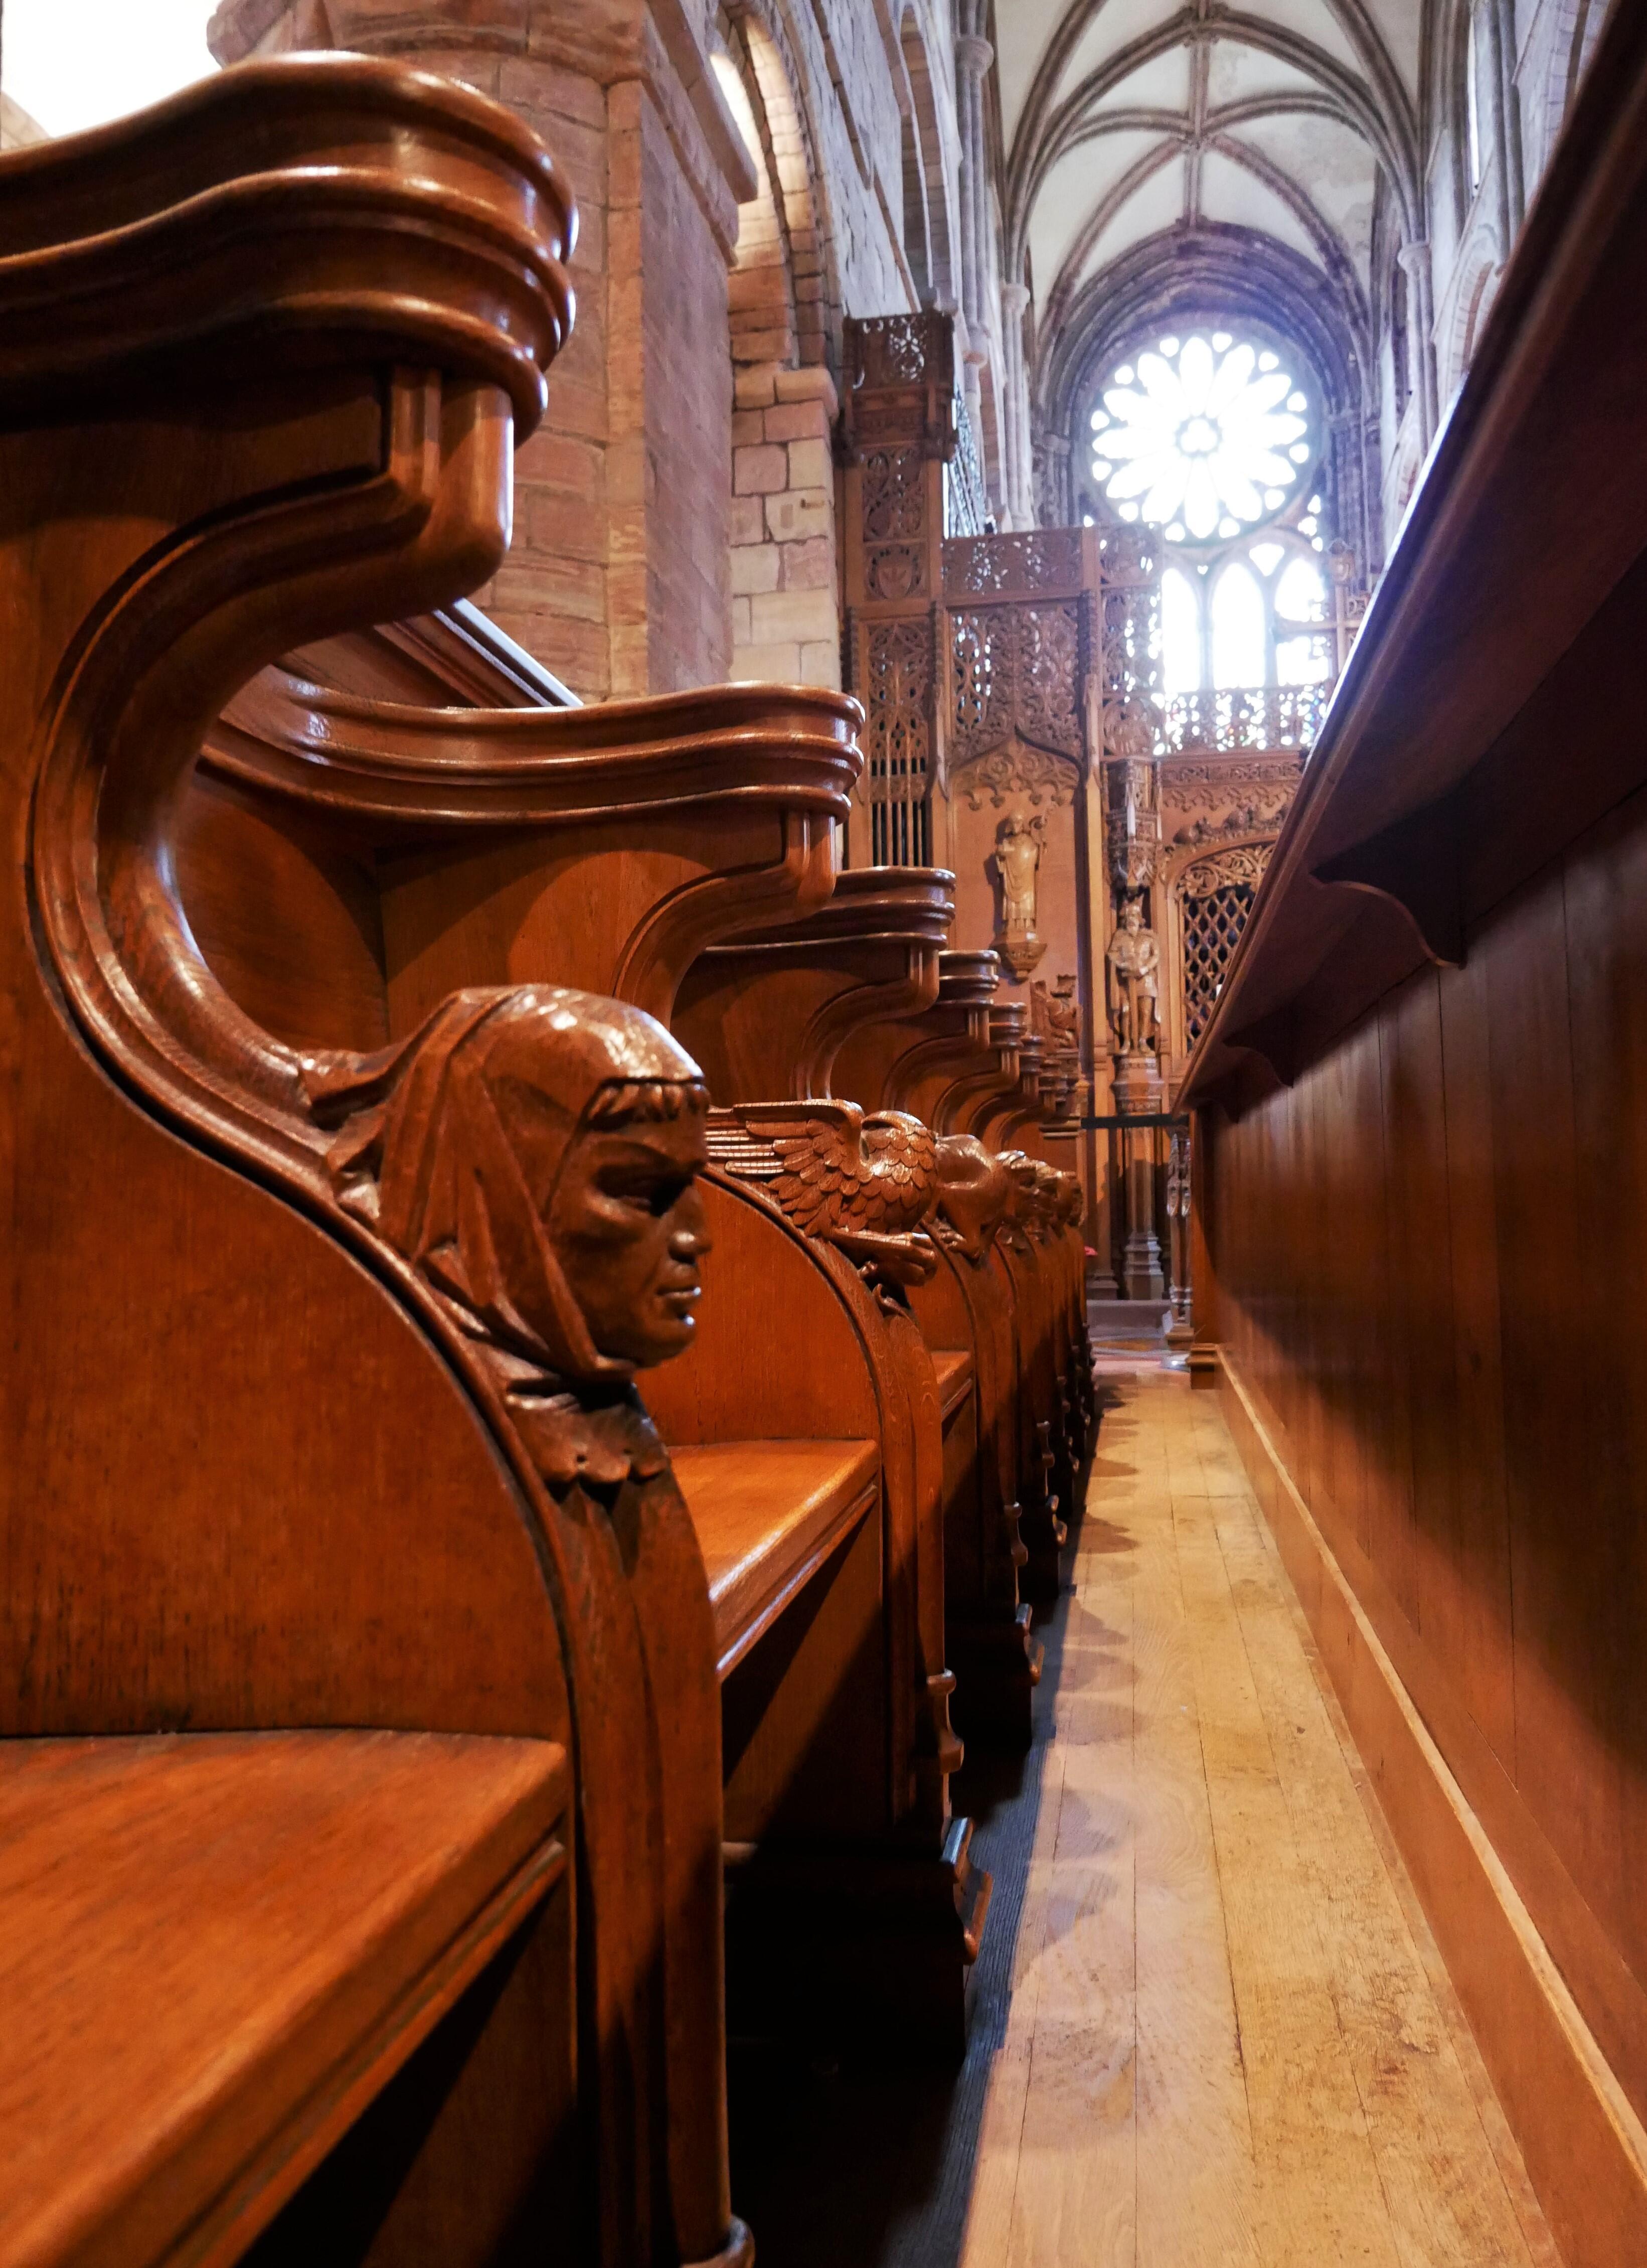 St Magnus Cathedral, Kirkwall, Orkney, Scotland, UK